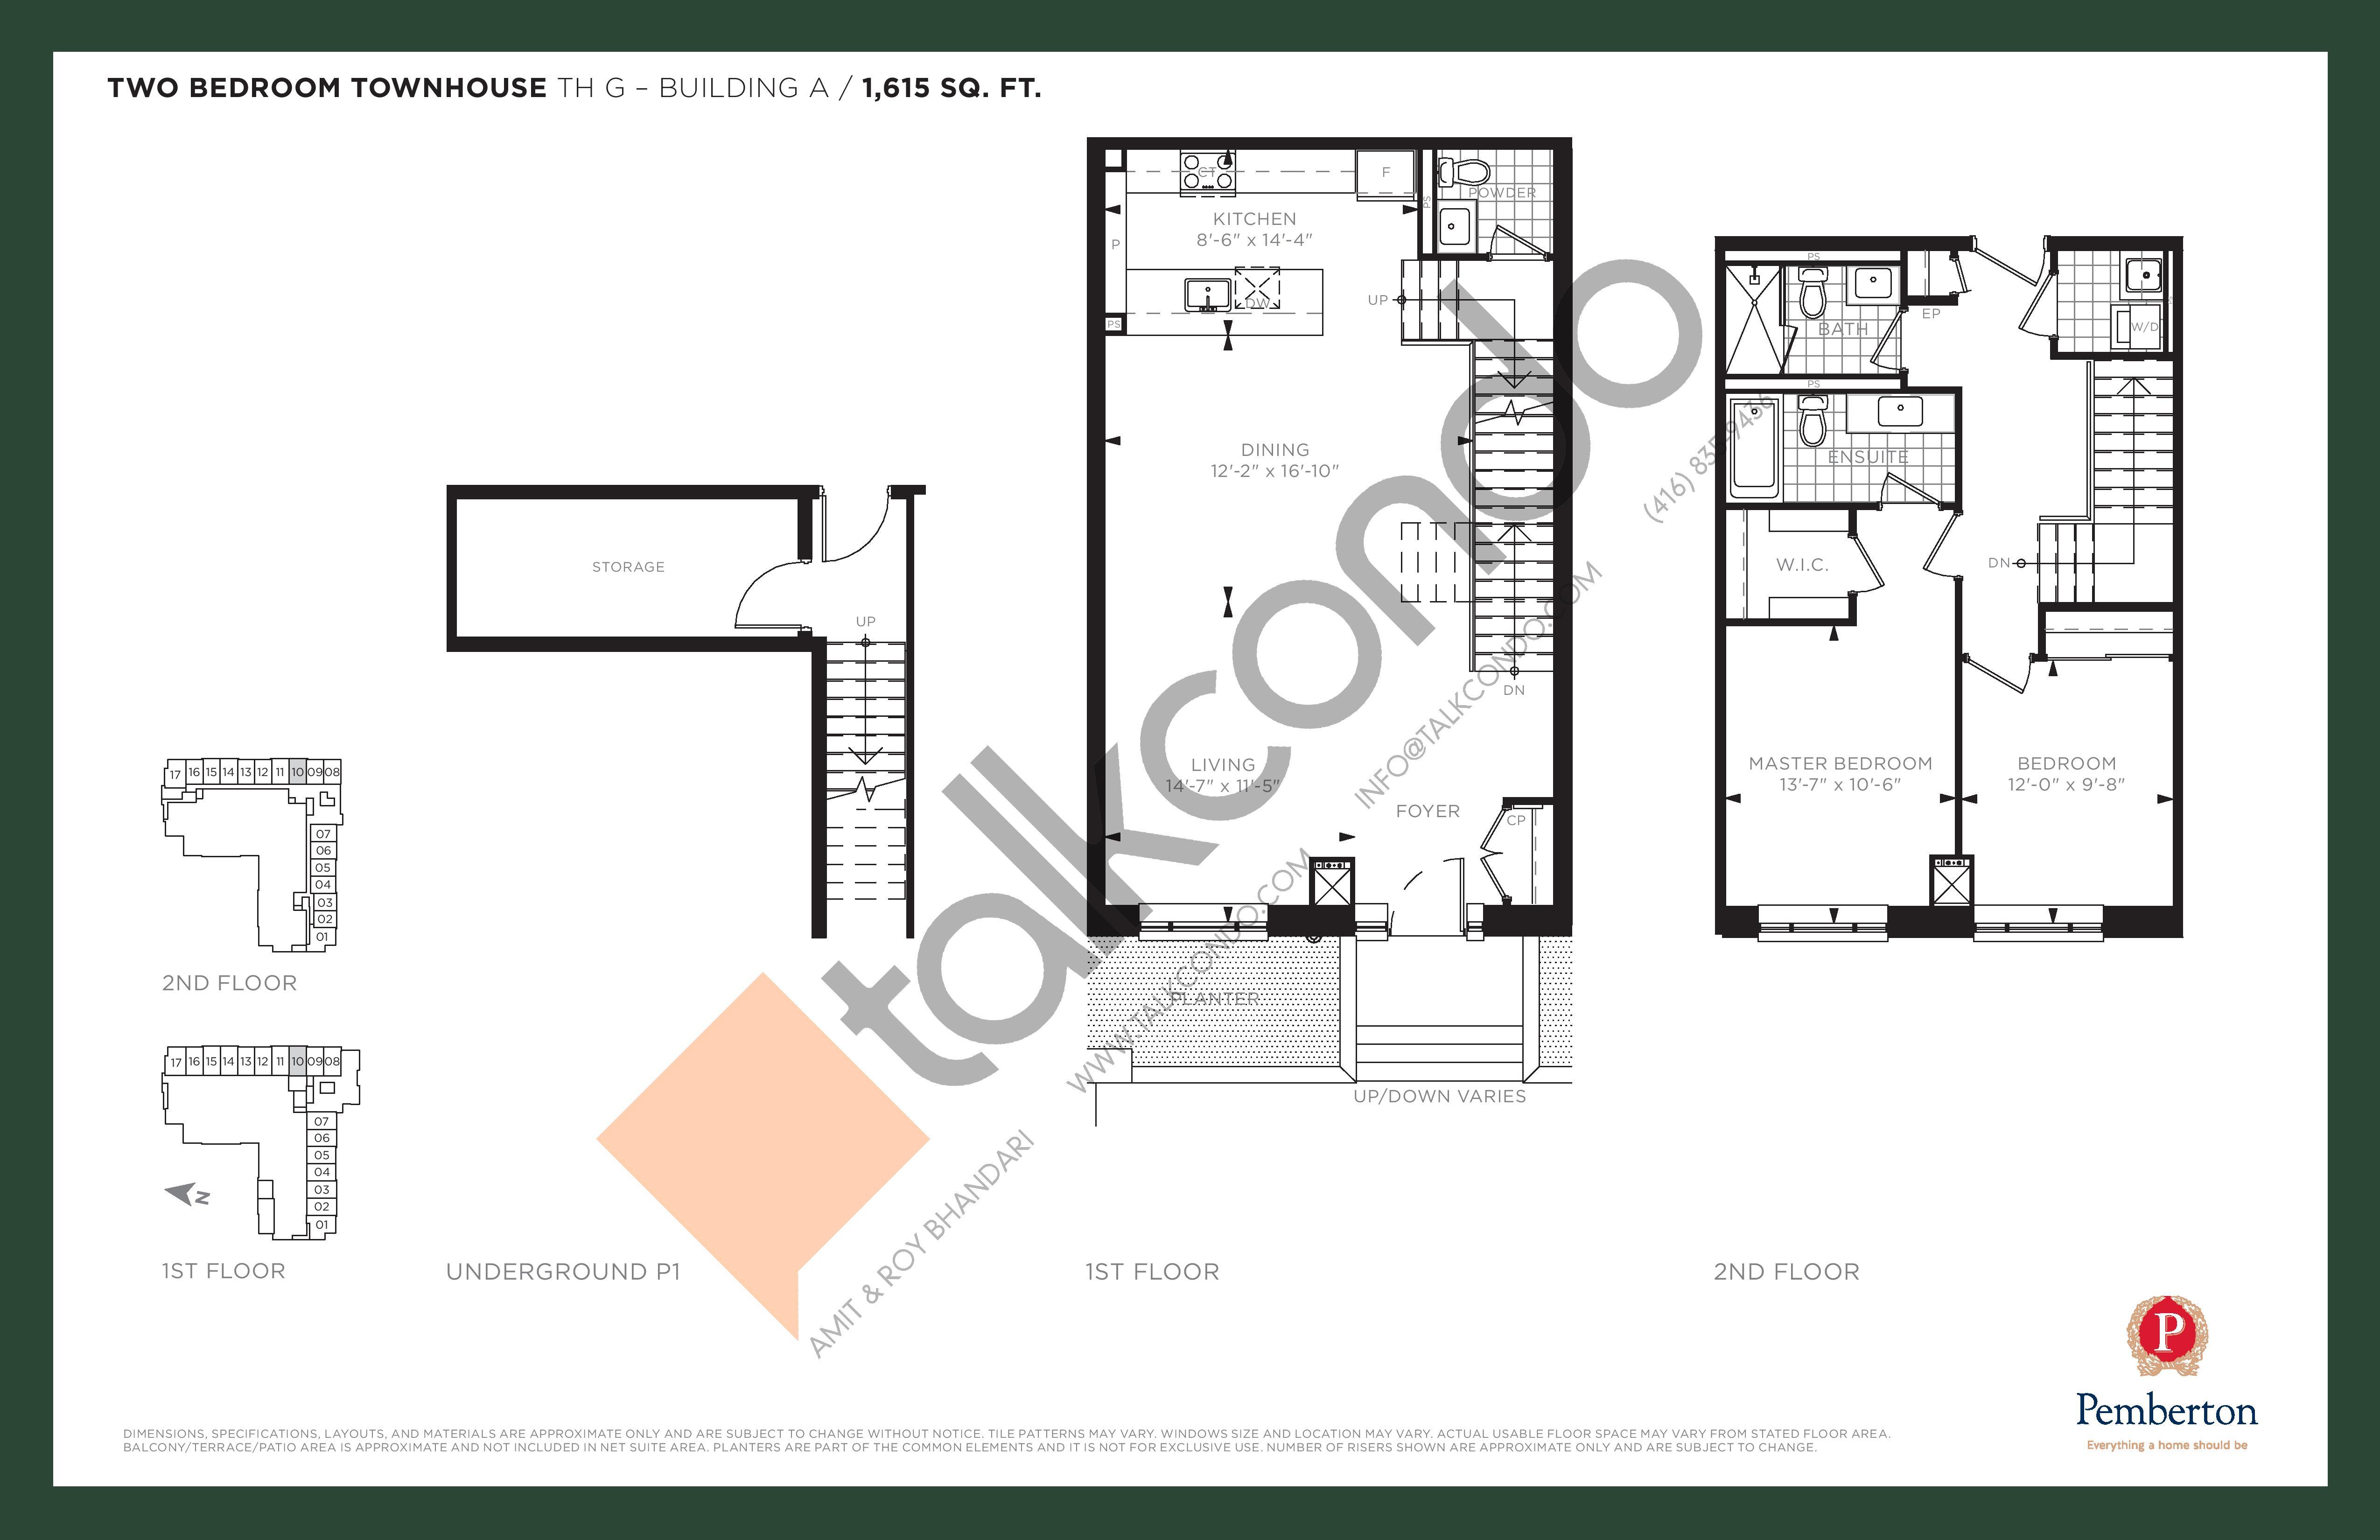 TH G - Building A Floor Plan at 9th & Main Condos + Towns - 1615 sq.ft